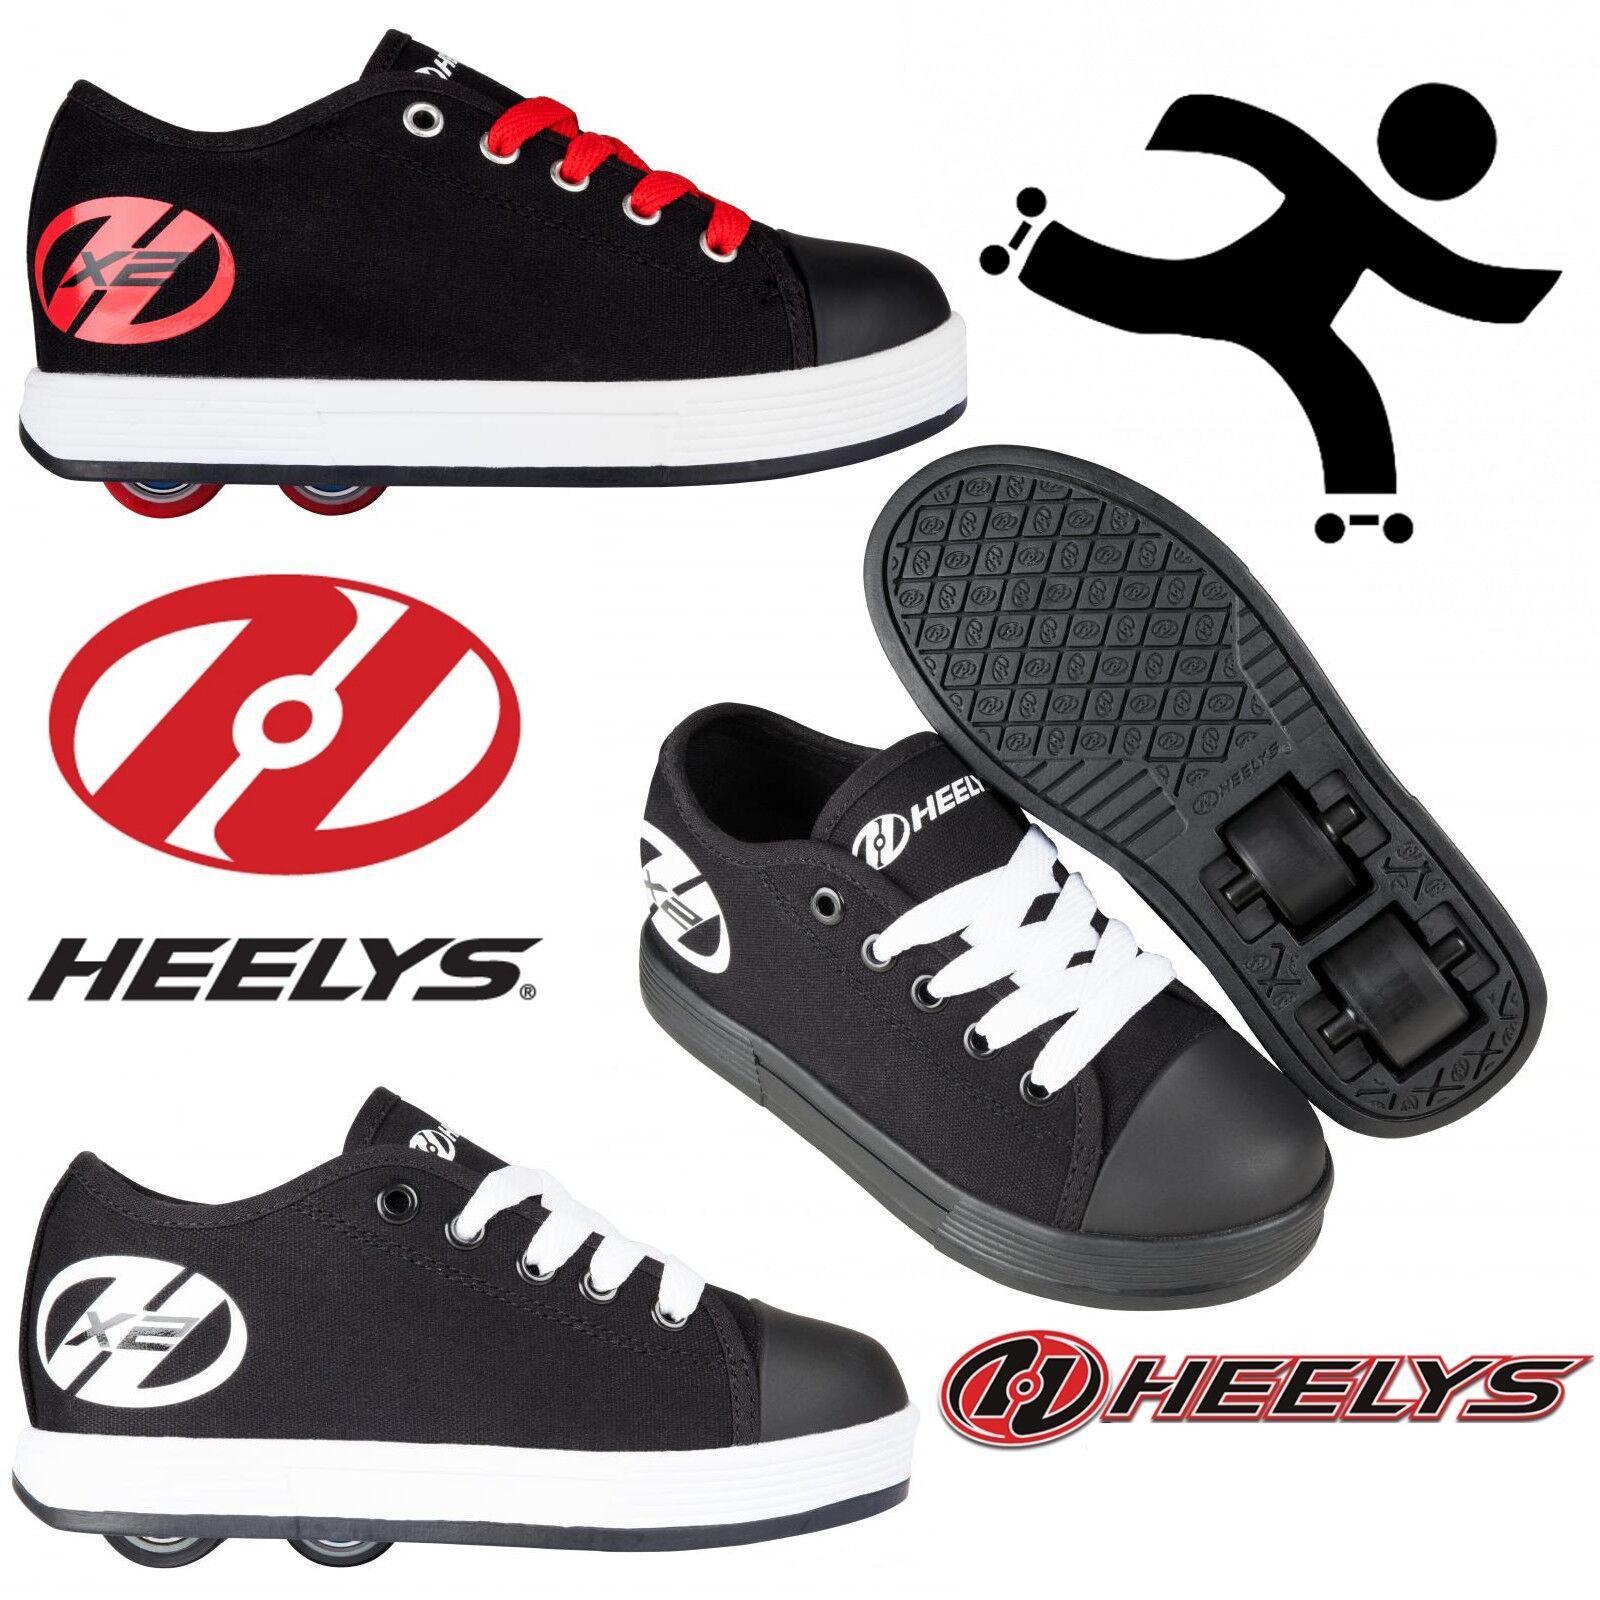 Novedades Heelys Fresh Kids Wheelie Trainers Girls Boys Black Roller Skate Shoes OFERTA